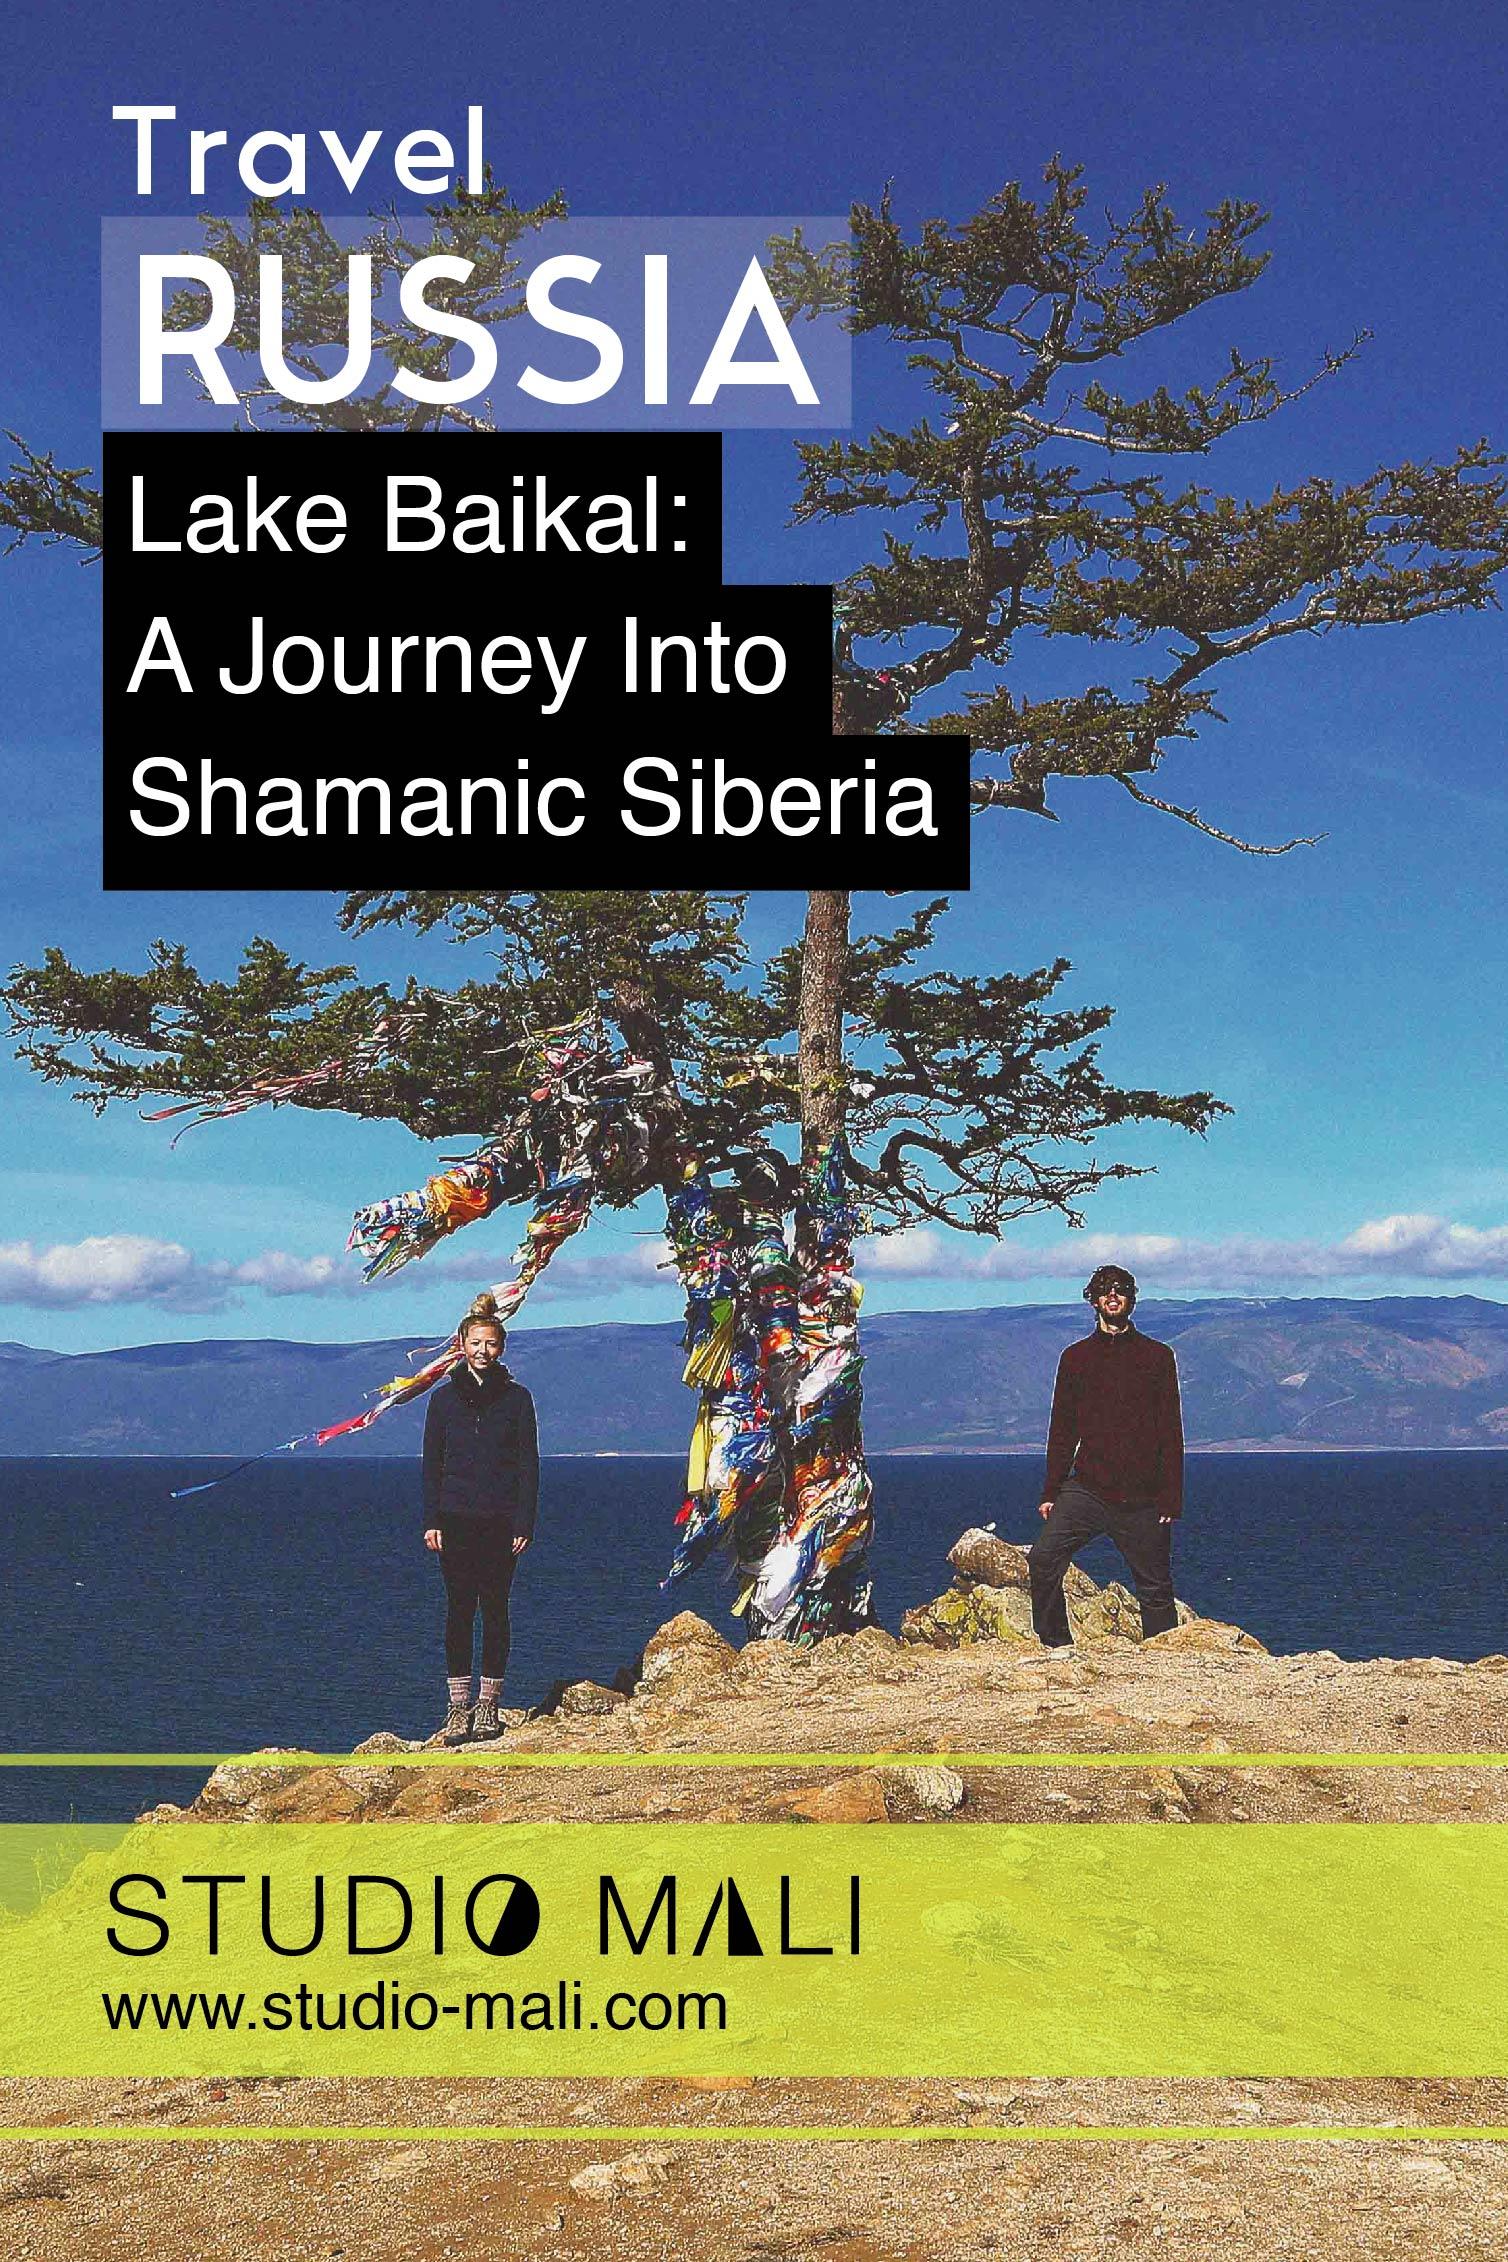 Russia - Lake Baikal, A Journey Into Shamanic Siberia, by Studio Mali